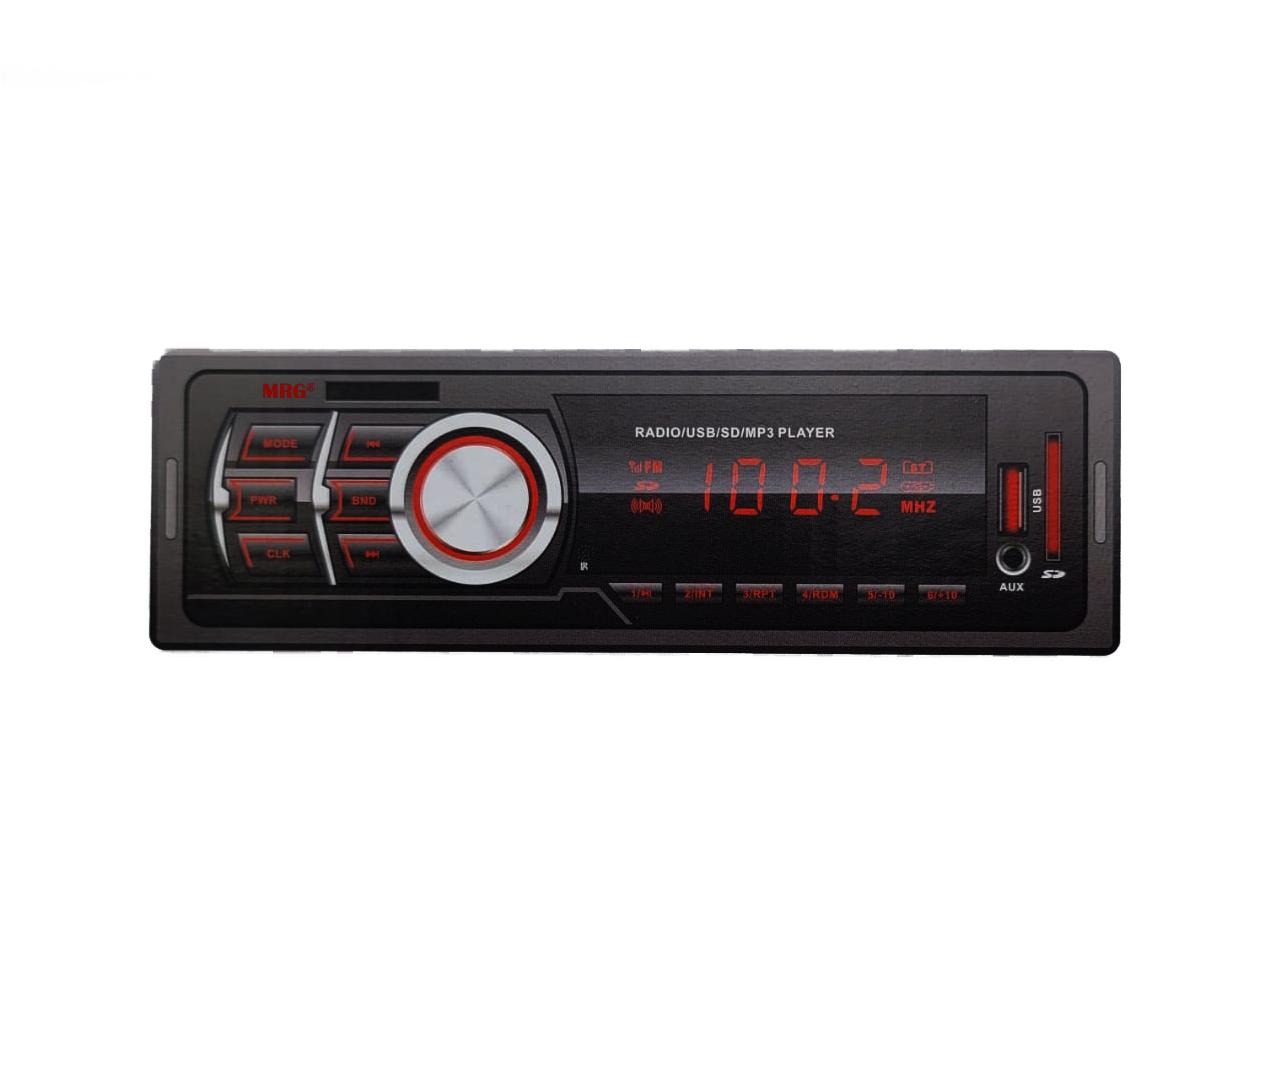 Casetofon Auto MRG MA603, Bluetooth, Cu telecomanda, Hands-free, Display rosu